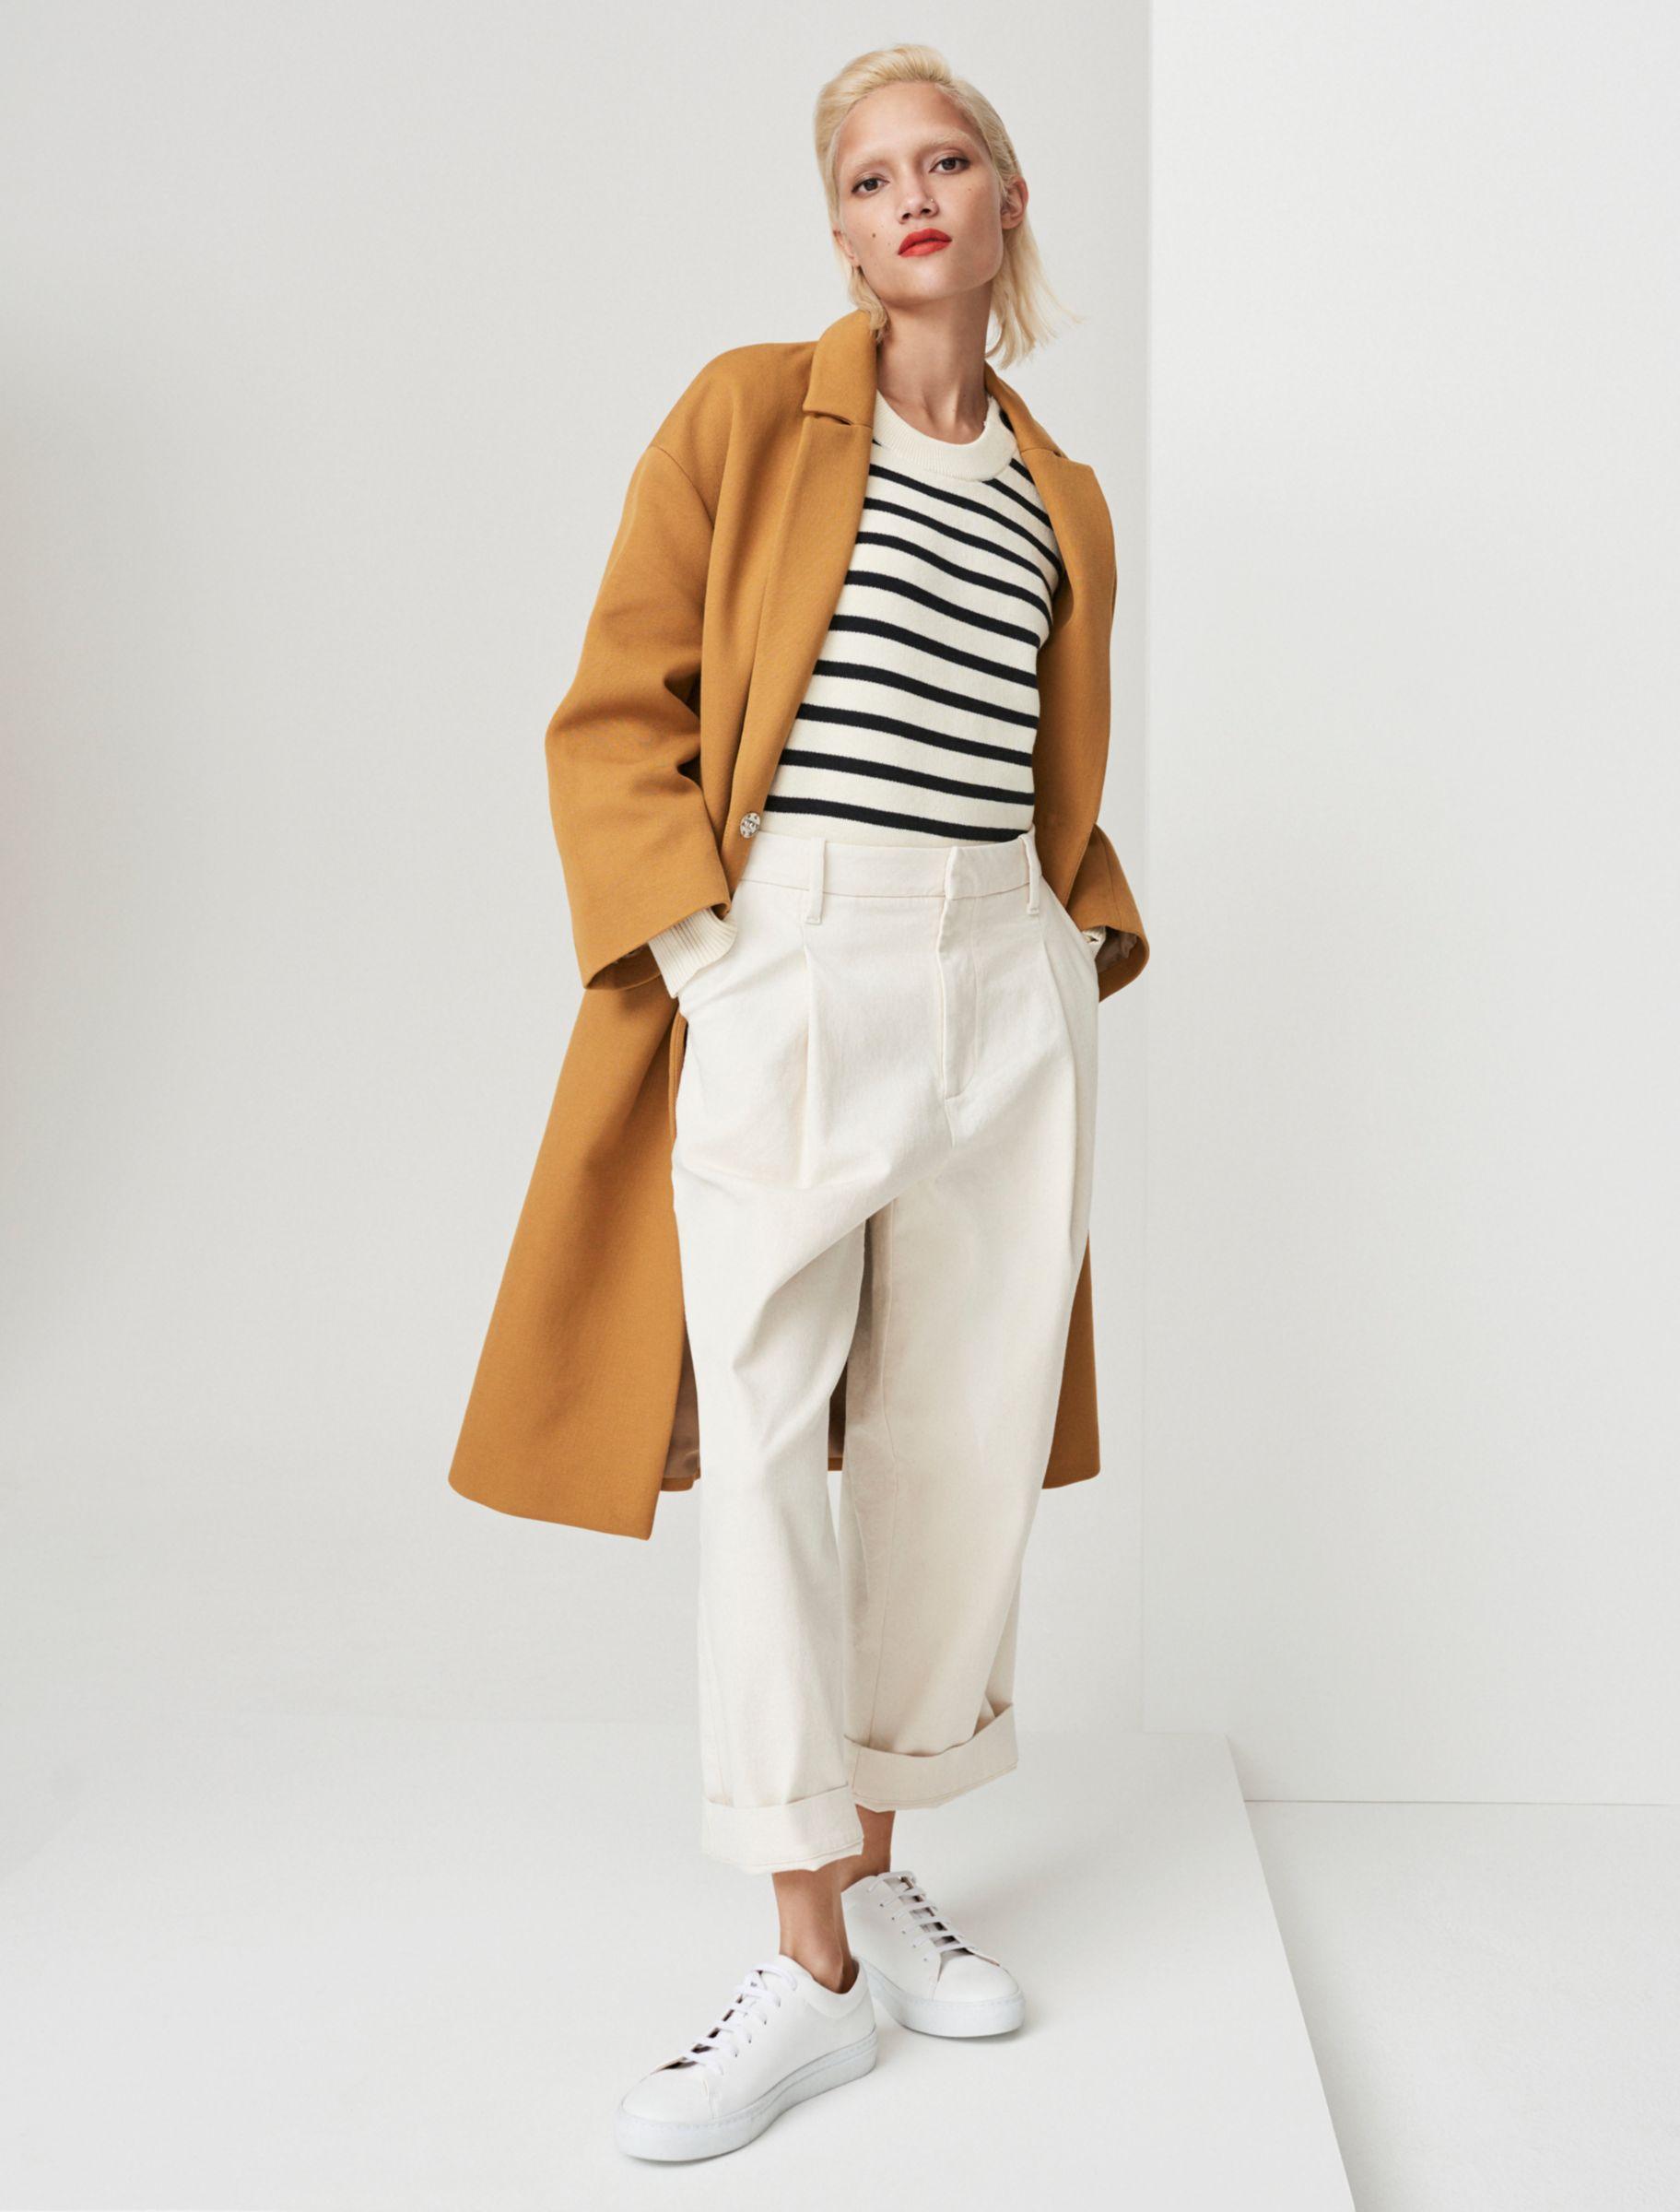 Woman in tan coat